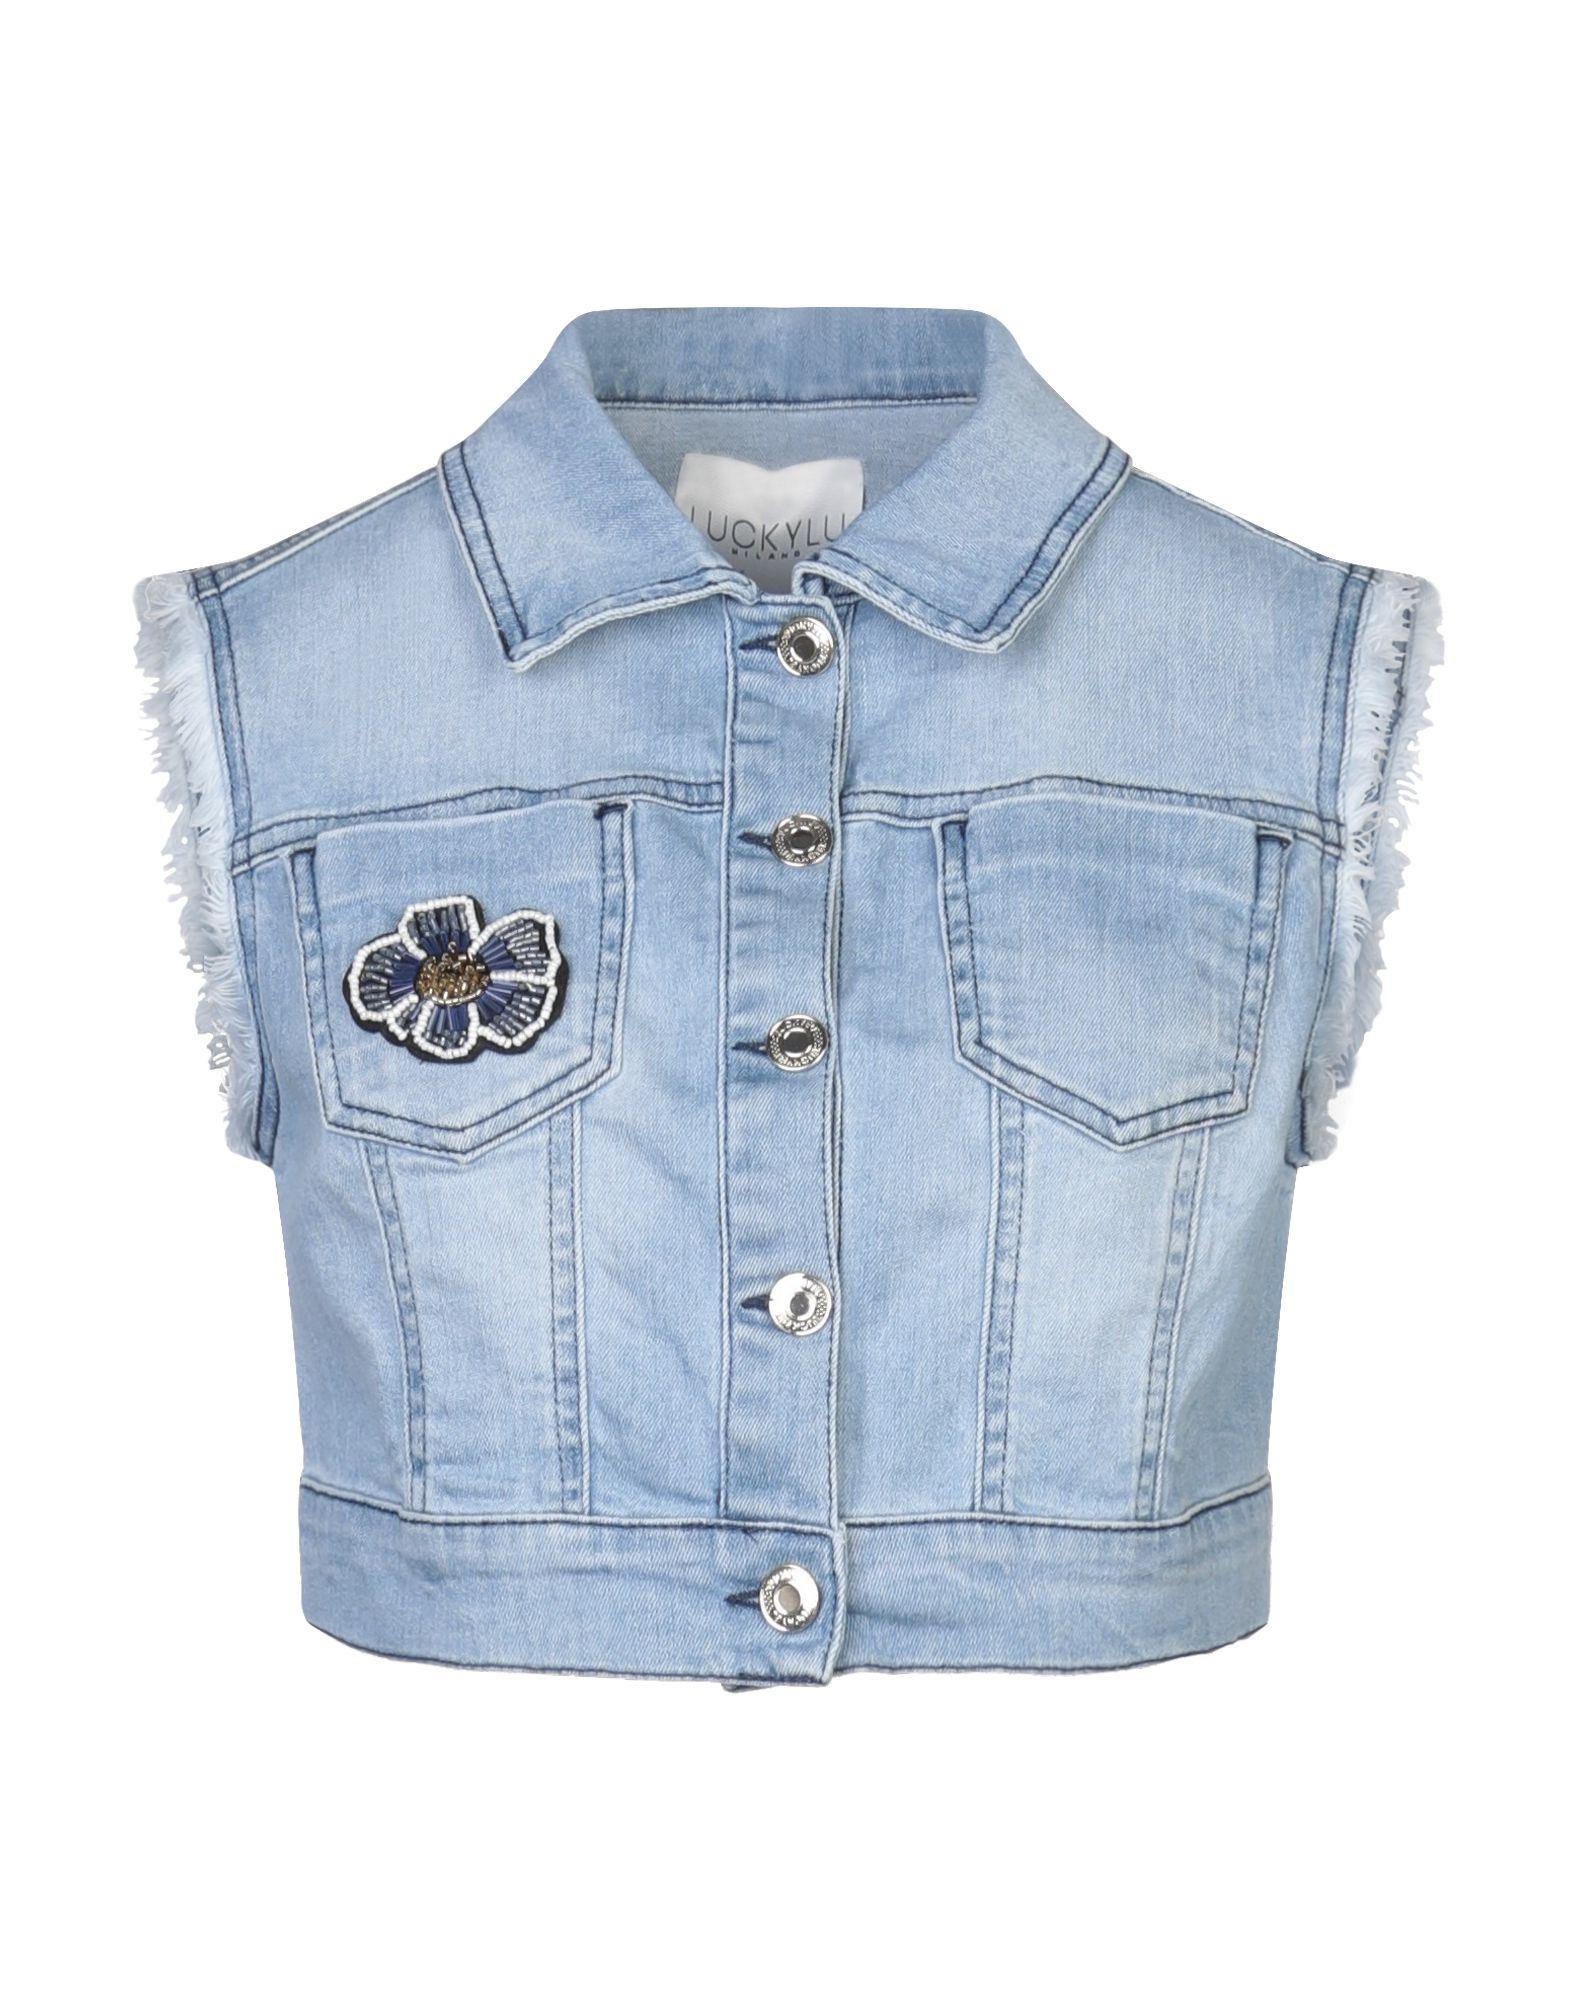 LUCKYLU Milano Джинсовая верхняя одежда family first milano джинсовая верхняя одежда